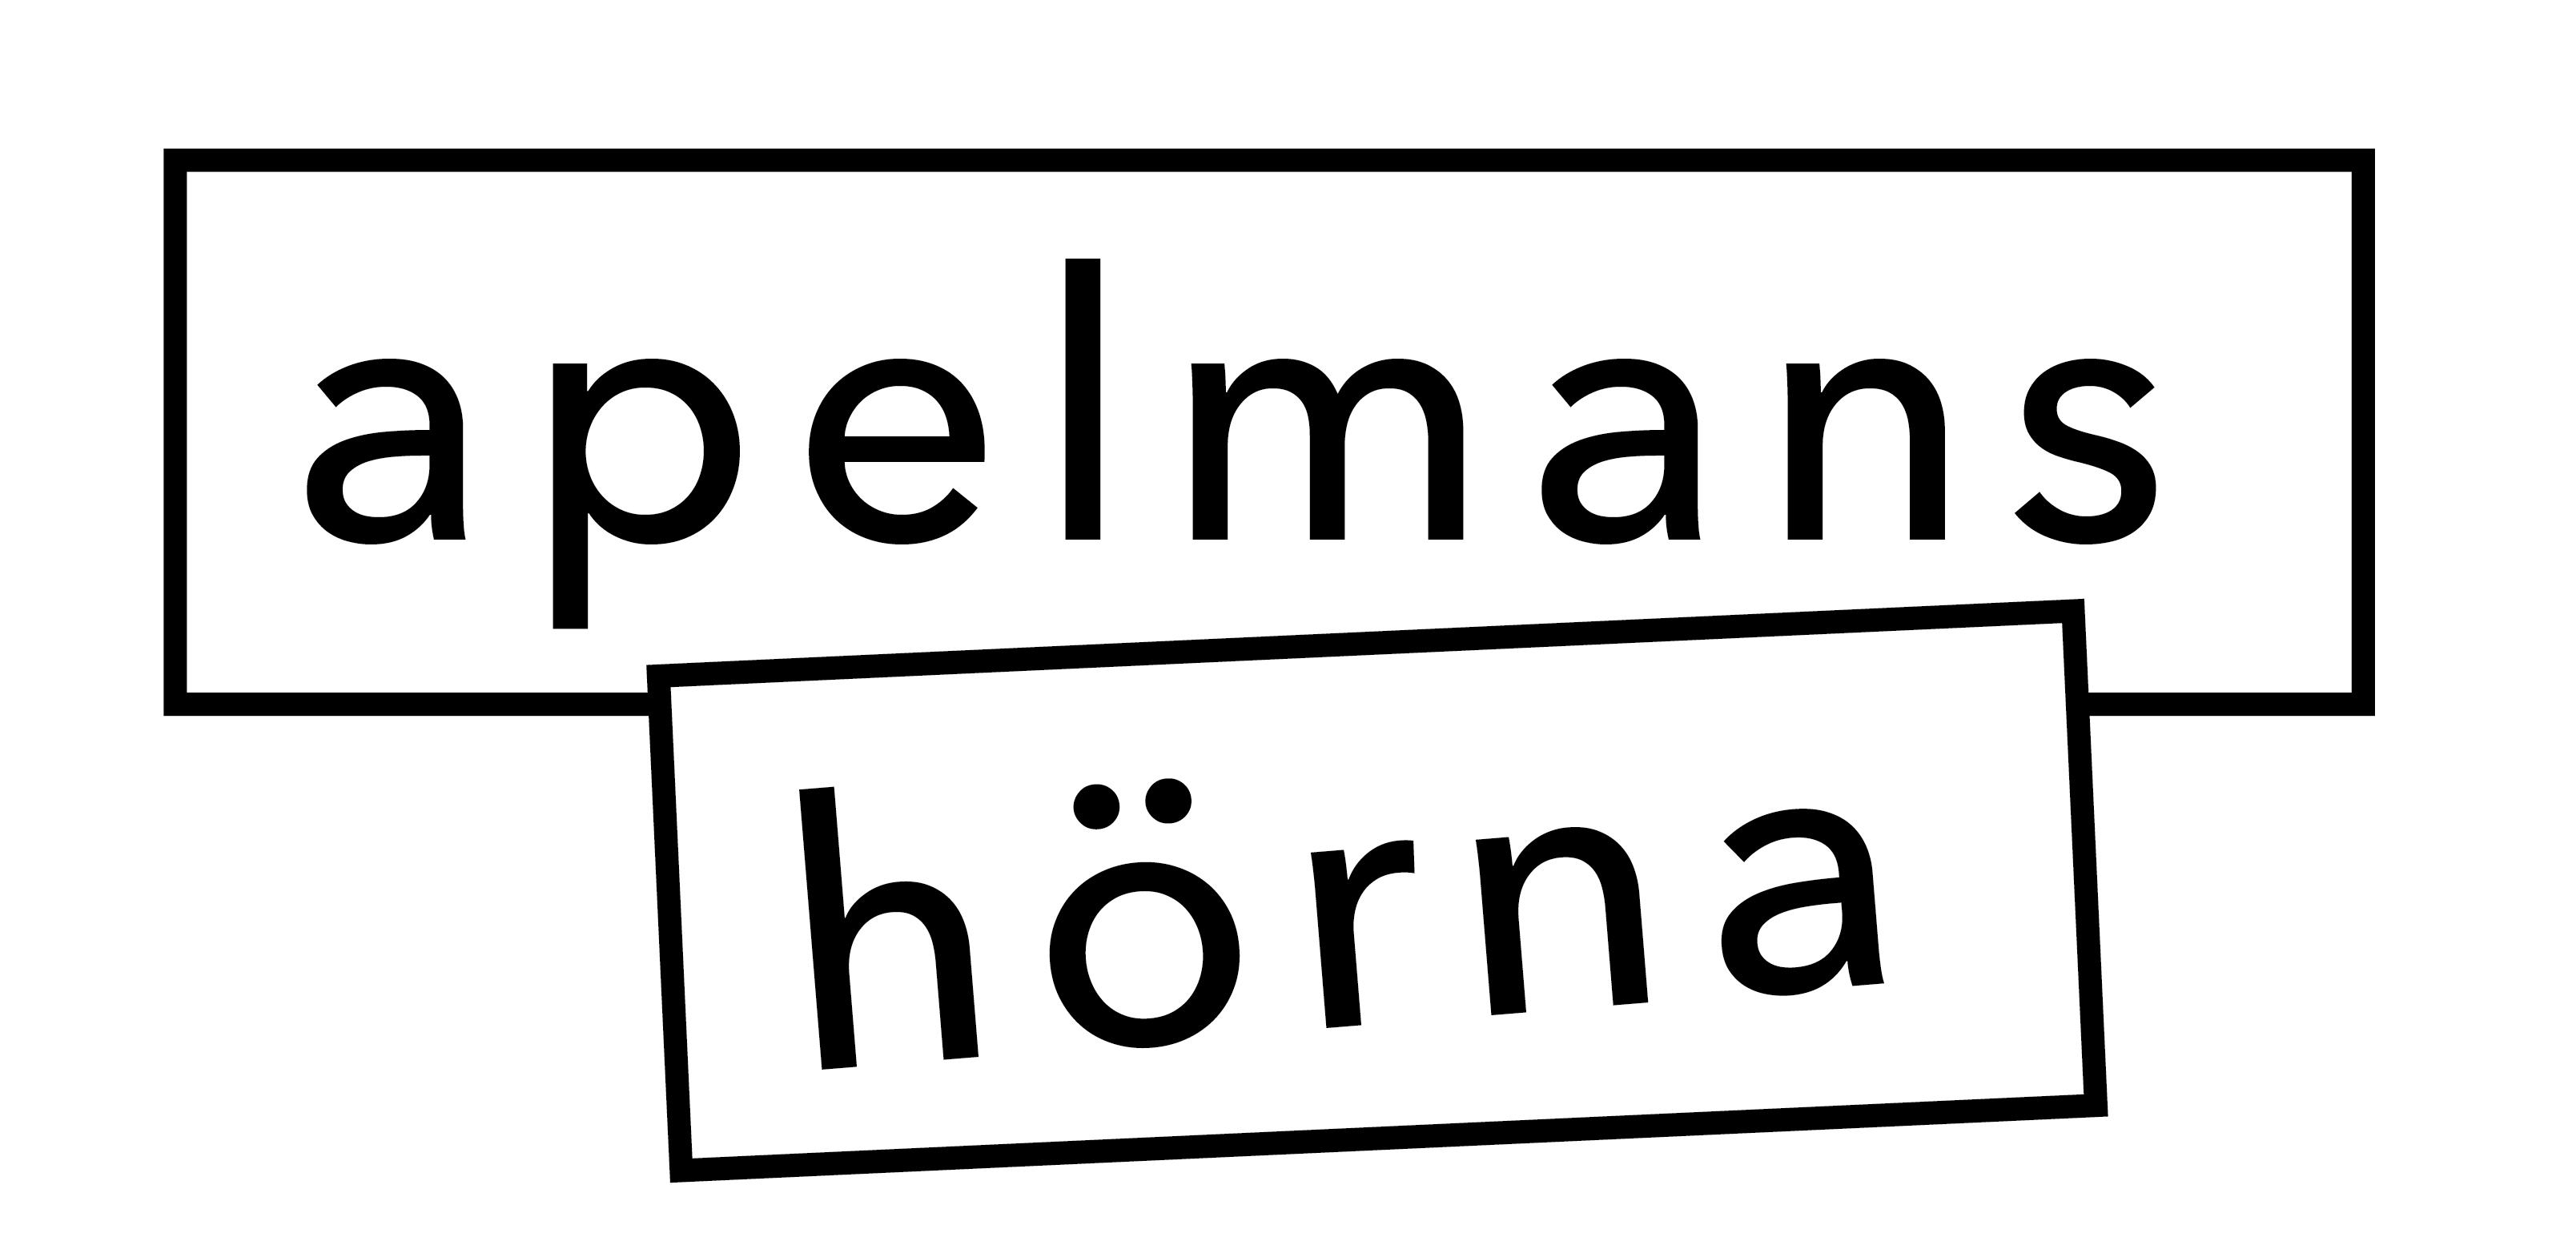 Jonas Apelman